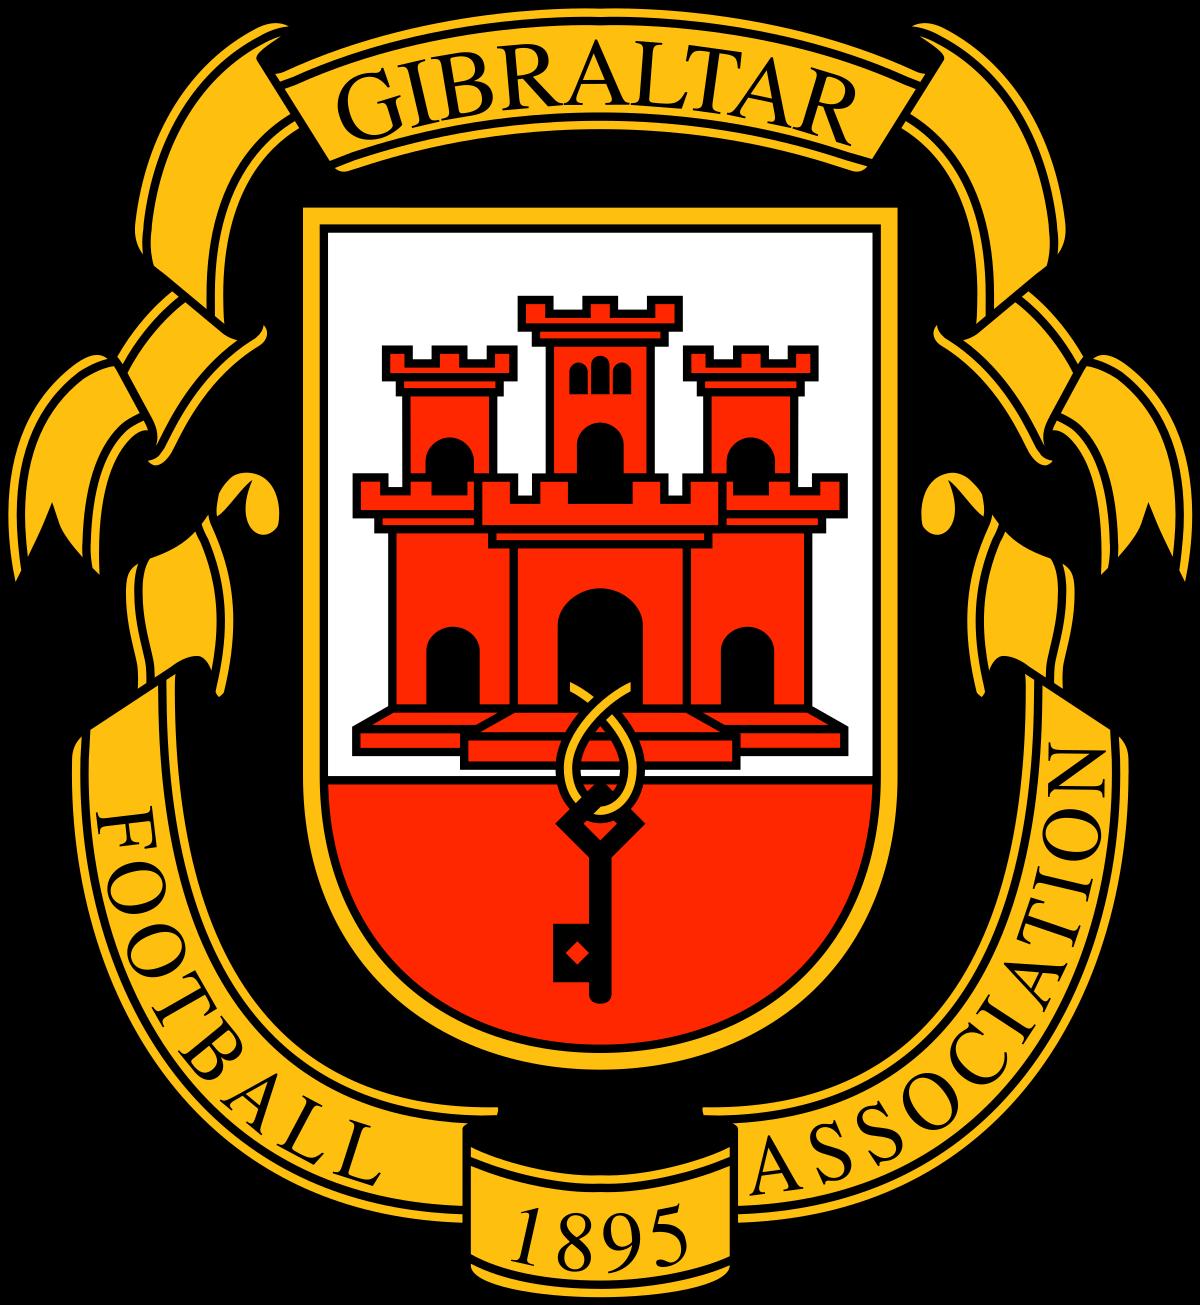 Ecusson équipe Gibraltar.png